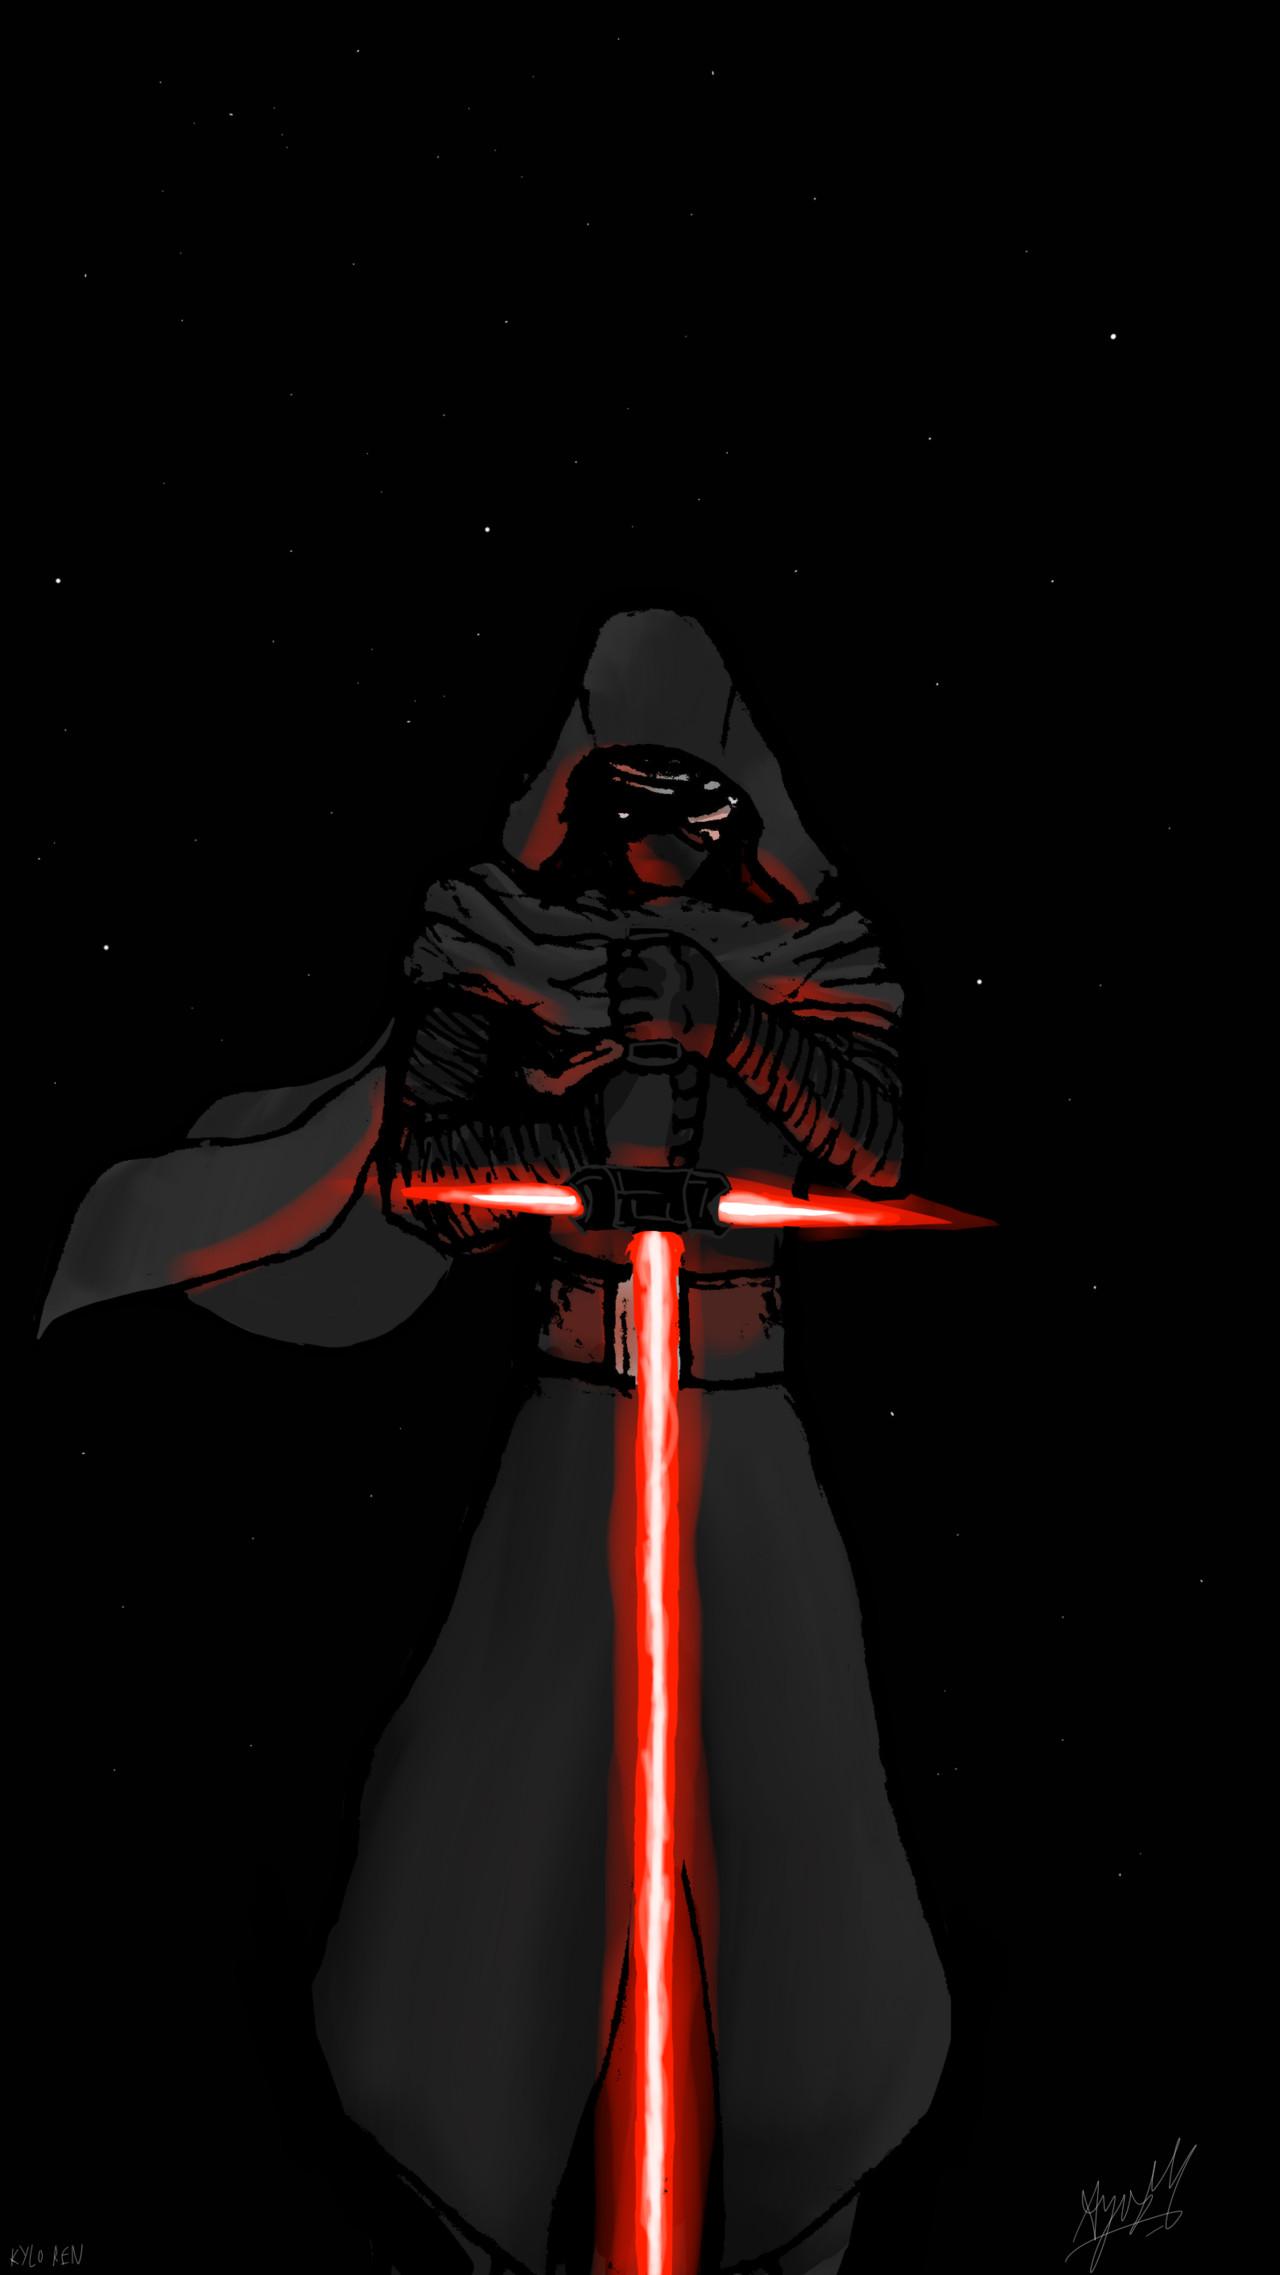 … MALIKISVENGEANCE STAR WARS The Force Awakens – Kylo Ren by  MALIKISVENGEANCE